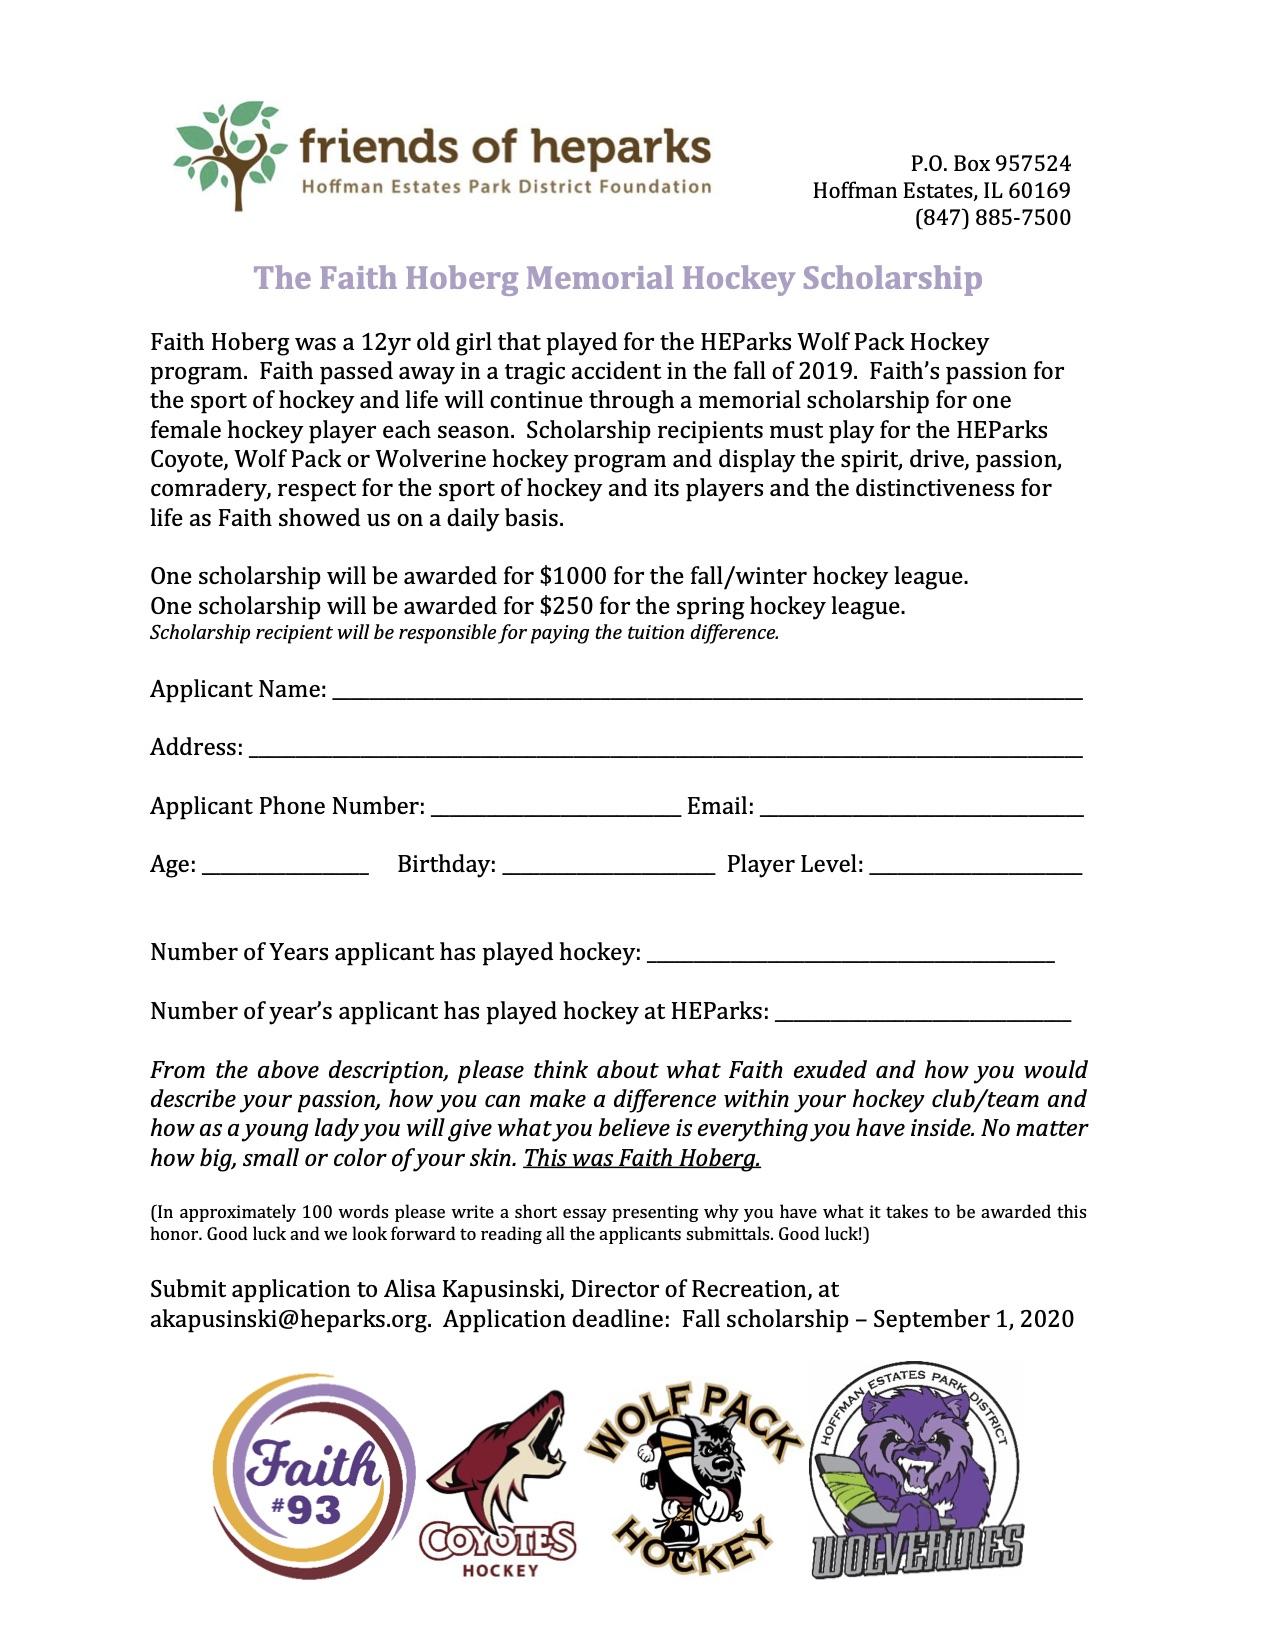 The Faith Hoberg Memorial Hockey Scholarship form